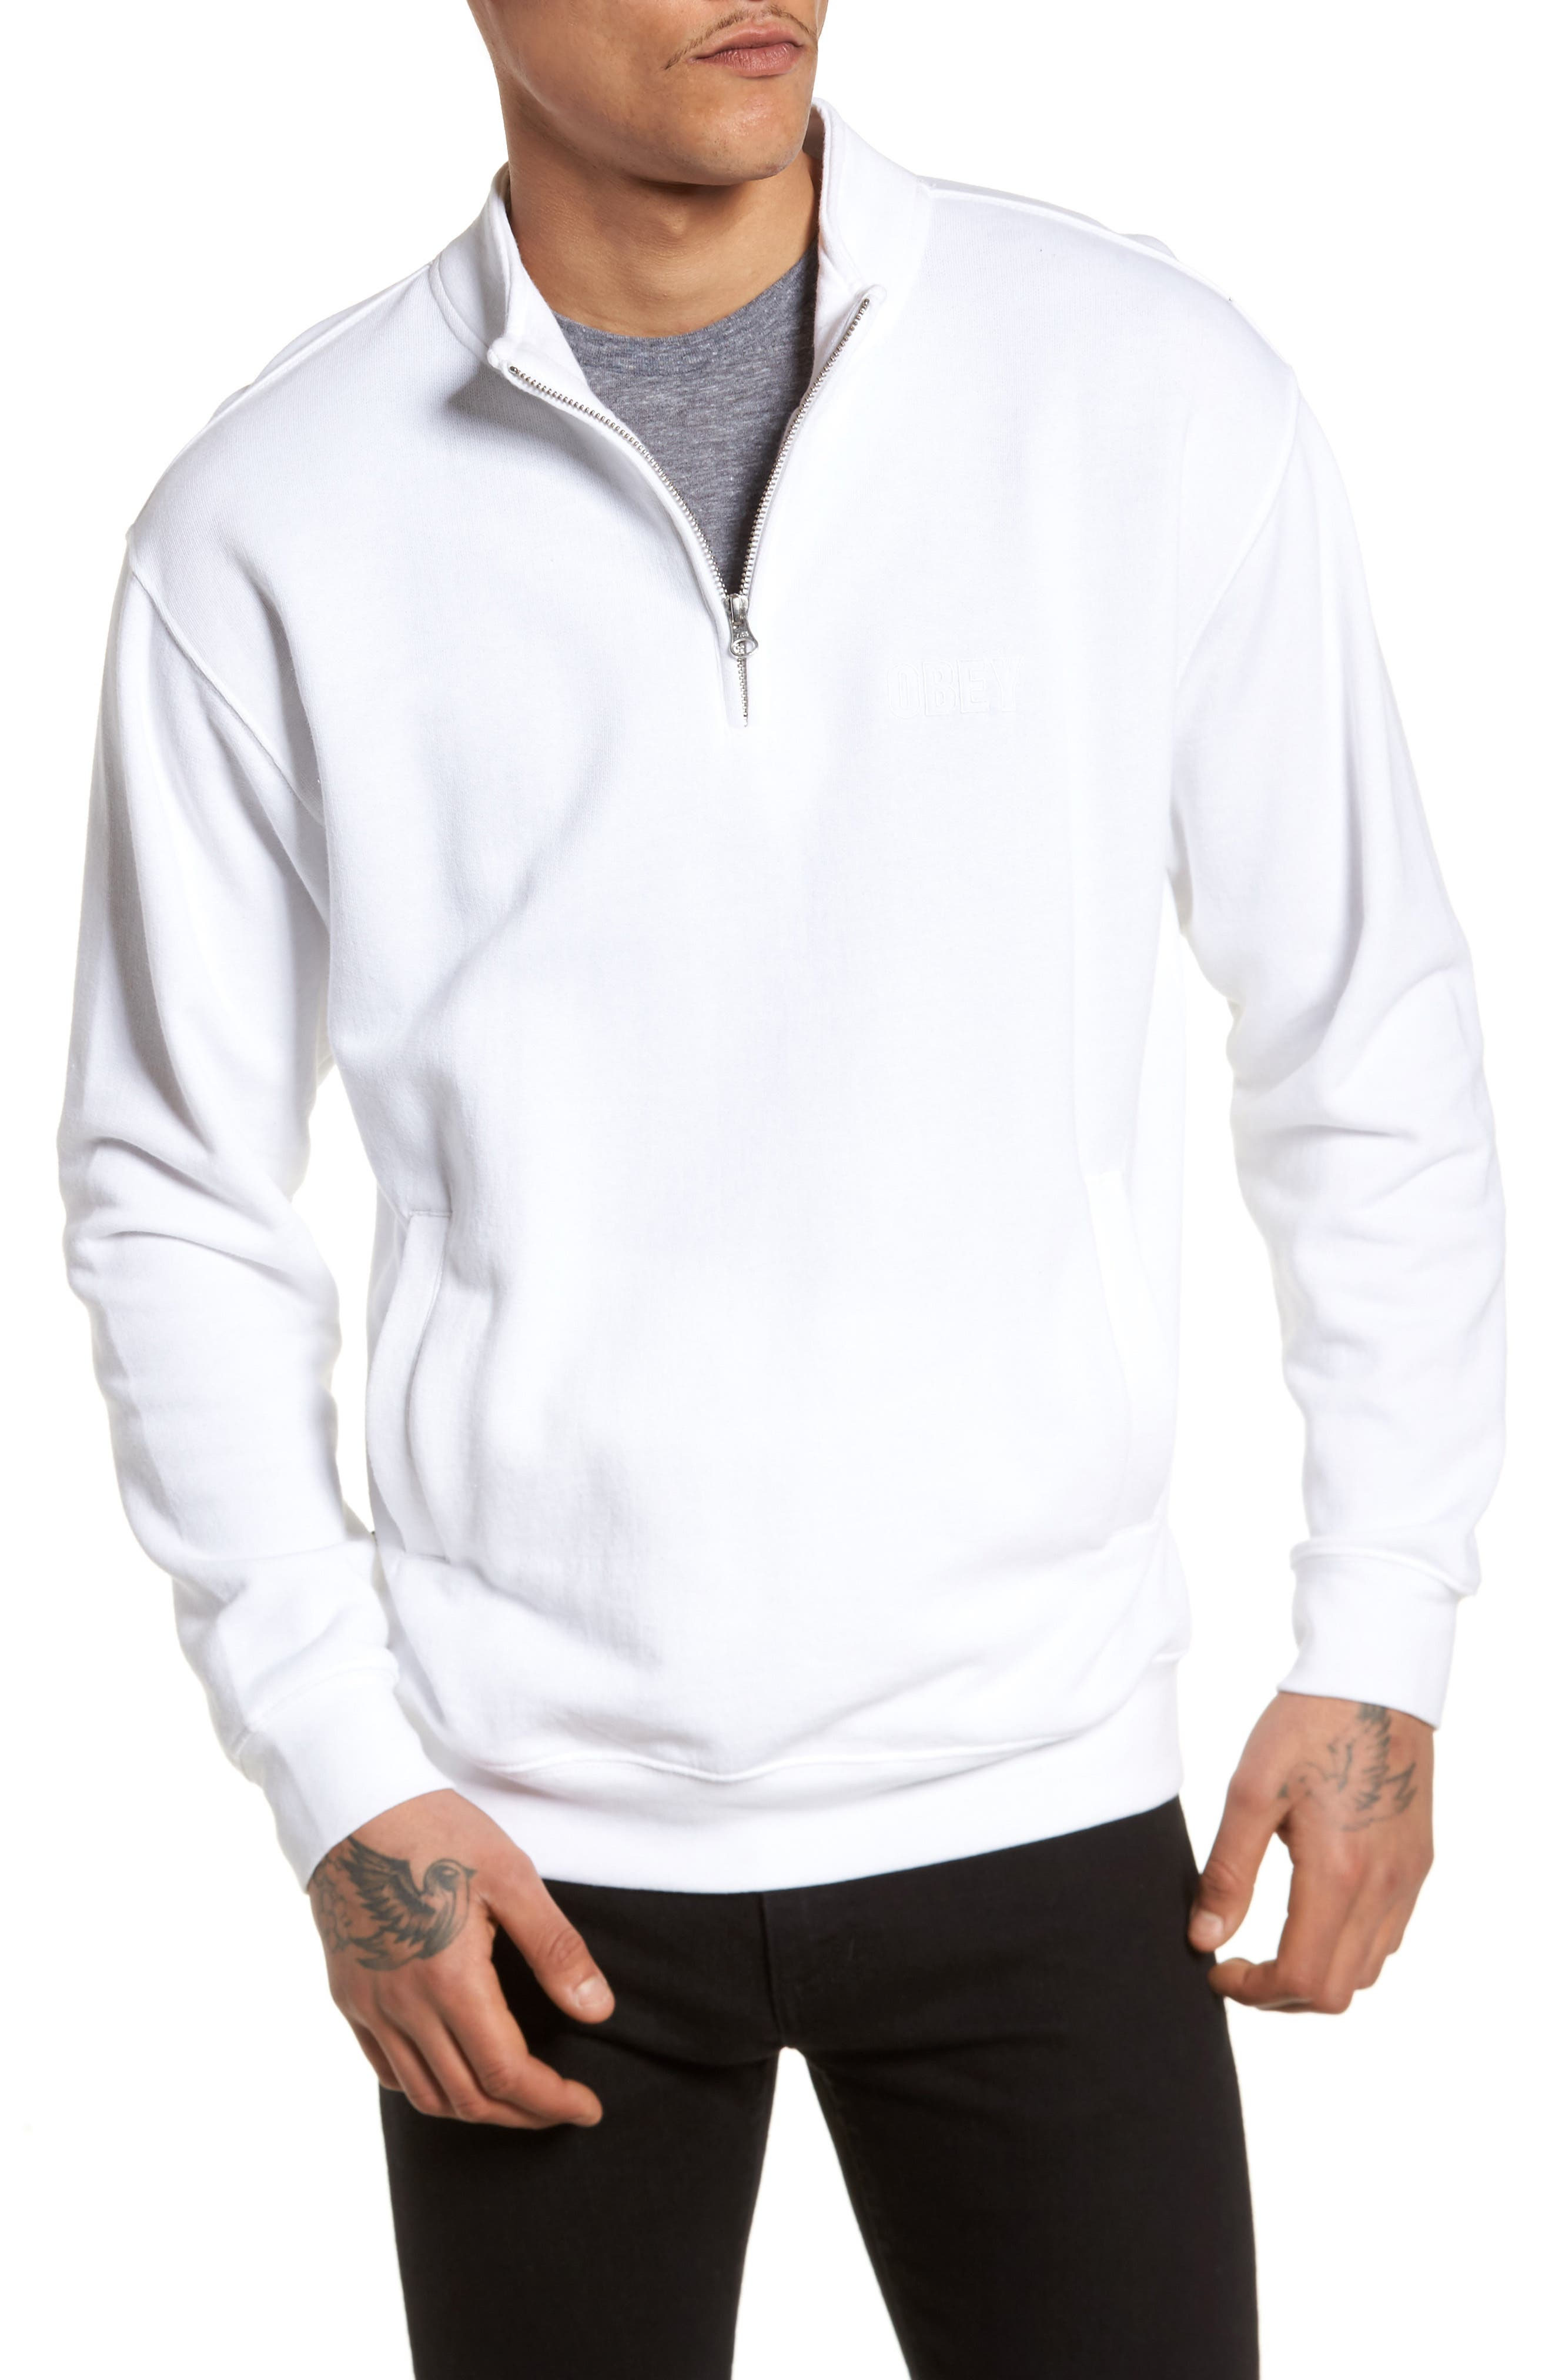 Main Image - Obey Atomatic Quarter-Zip Fleece Pullover